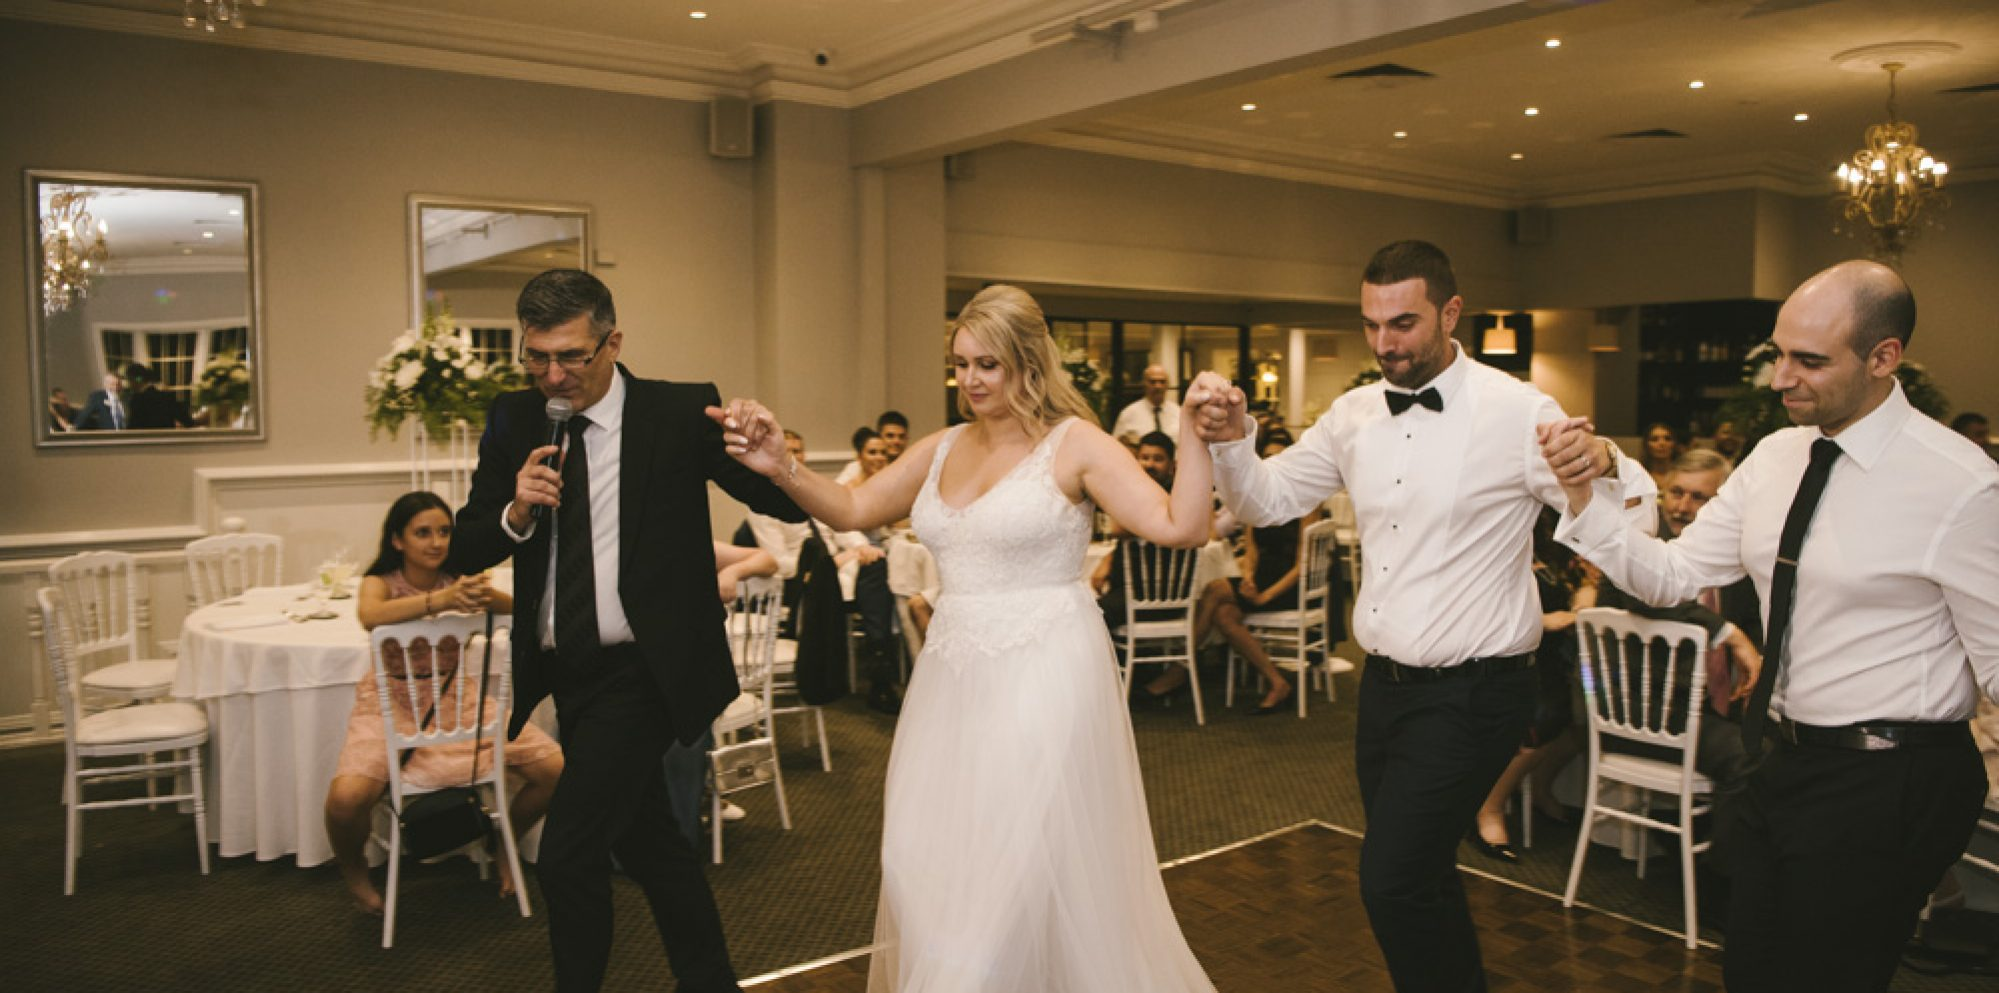 11 evergreen greek wedding traditions followed by australian greeks